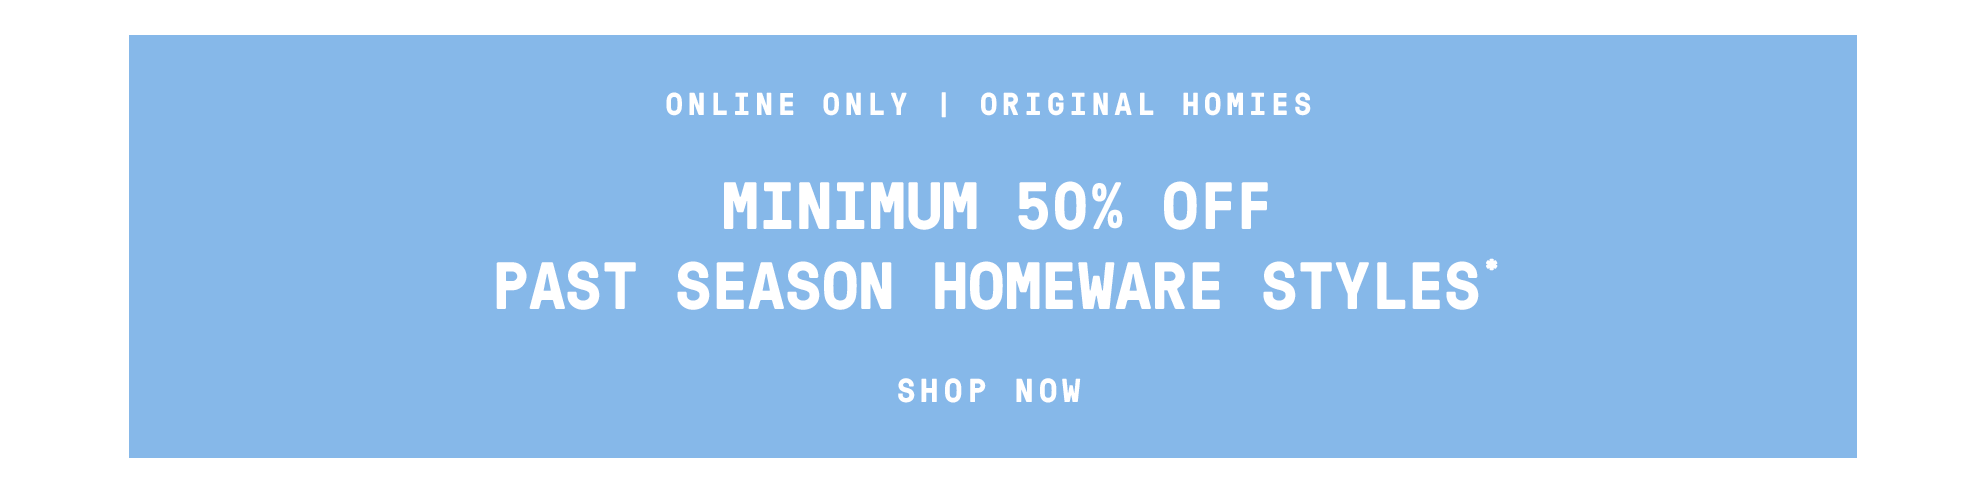 Minimum 50% off past season homeware styles*